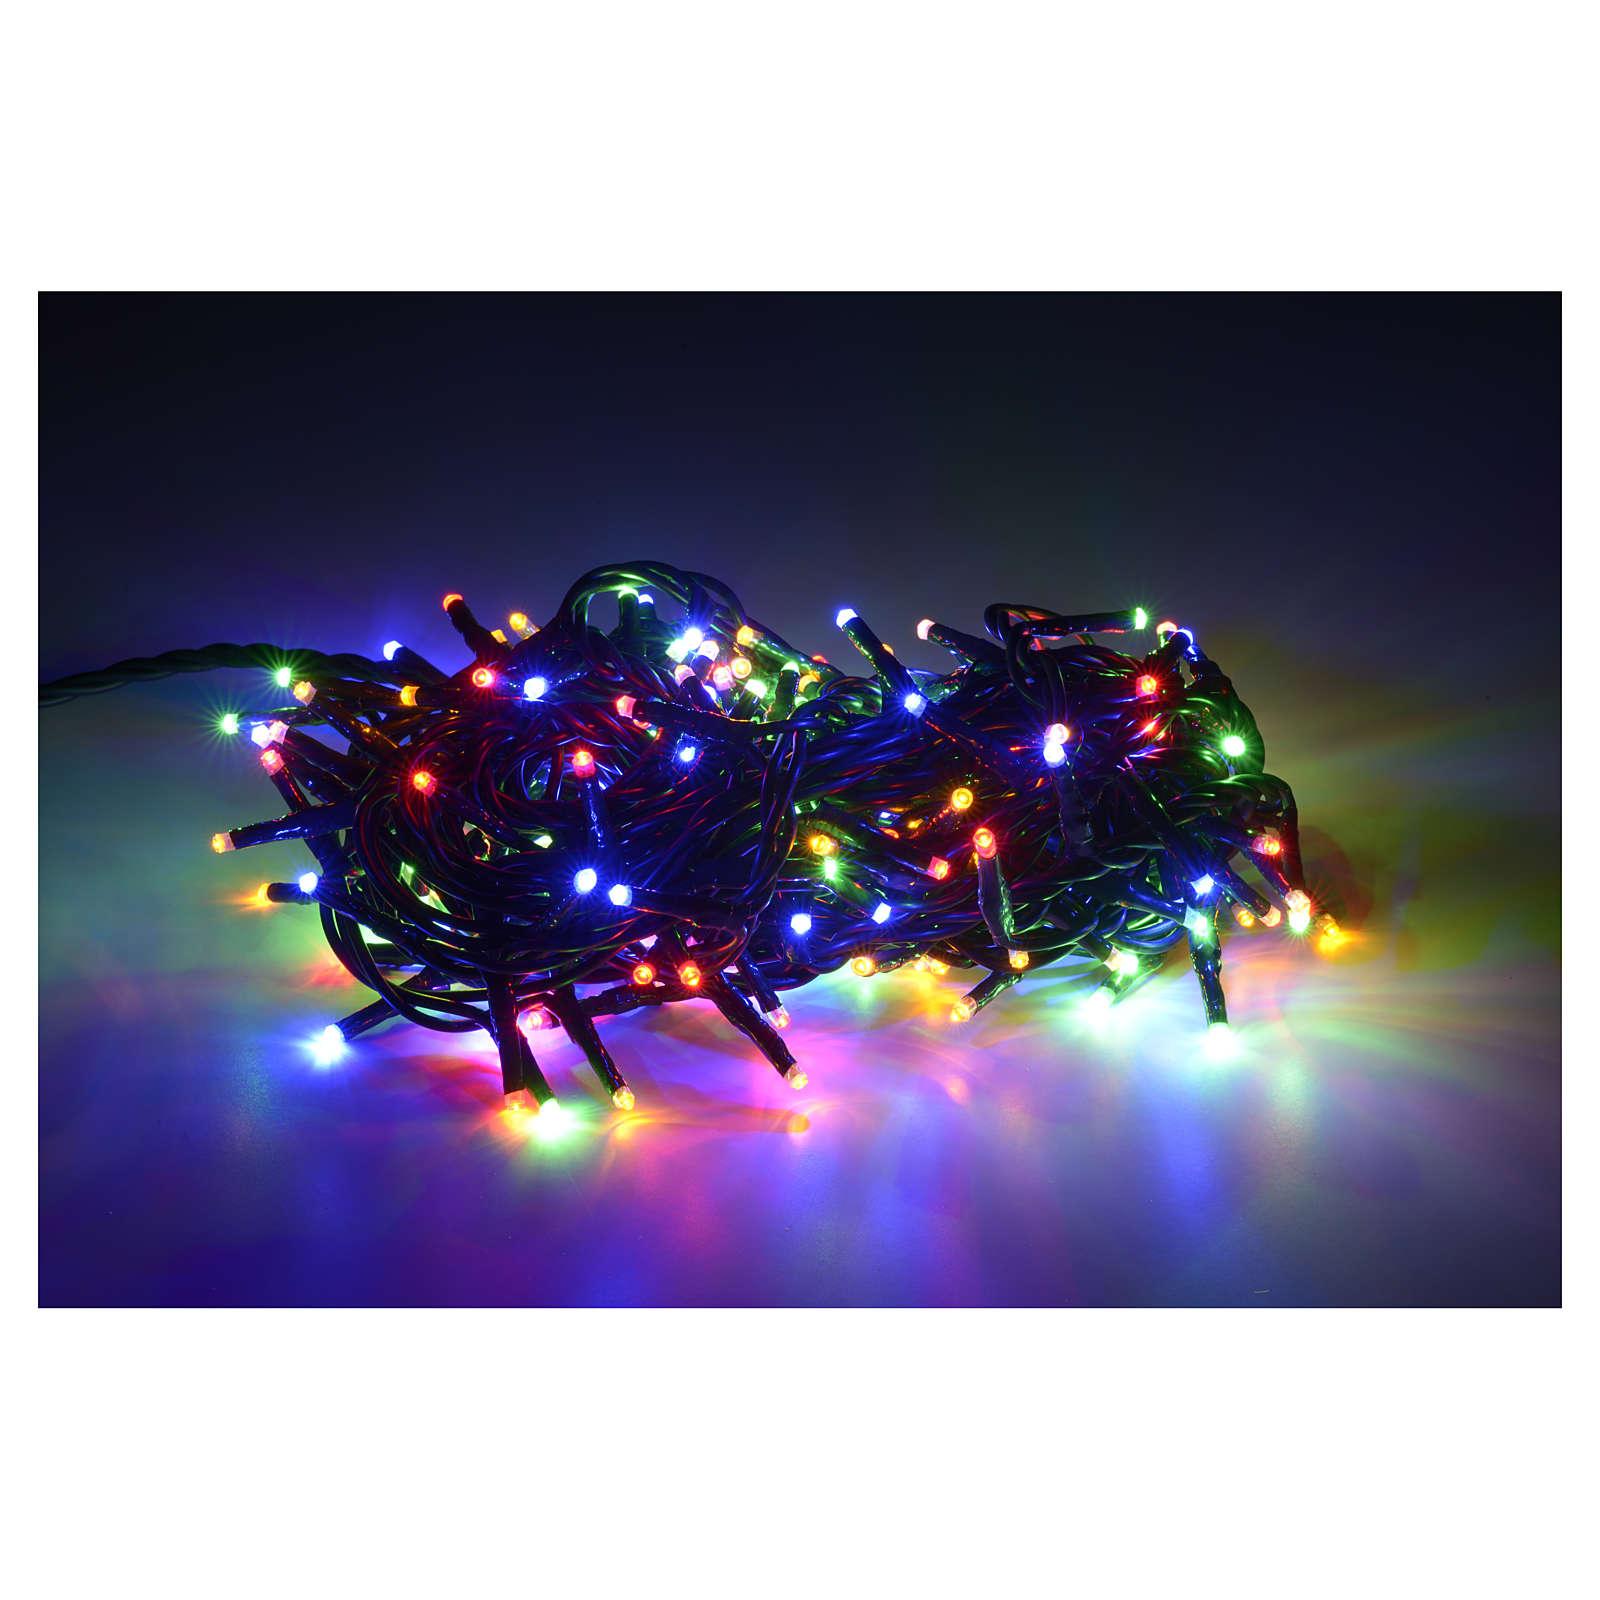 100 LED MULTICOLOUR FAIRY LIGHTS. INDOOR USE. PAR750809